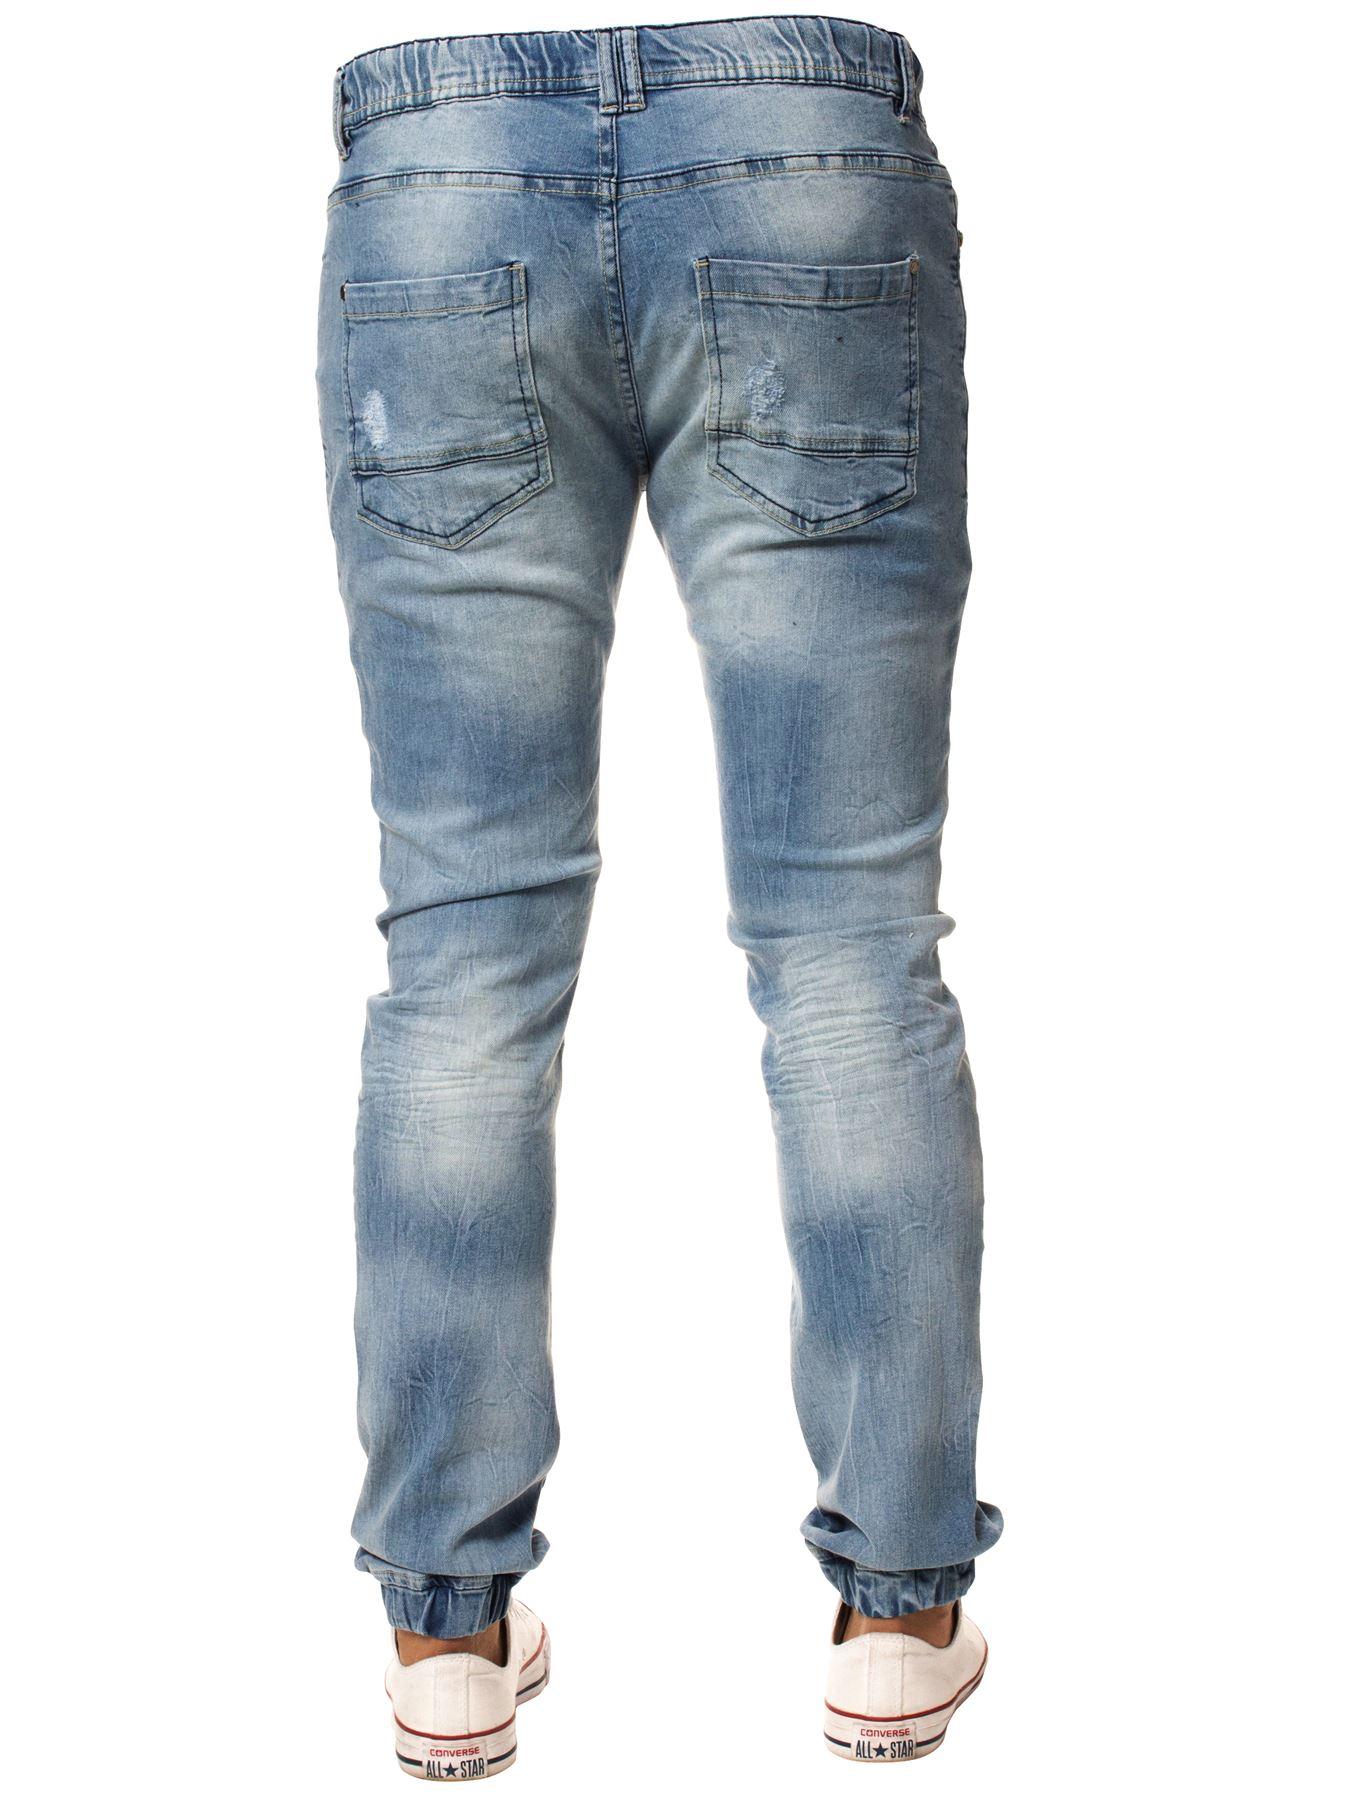 Enzo-Mens-Cuffed-Jeans-Stretch-Fit-Ripped-Denim-Jogger-Pants-Big-Tall-All-Waists thumbnail 13